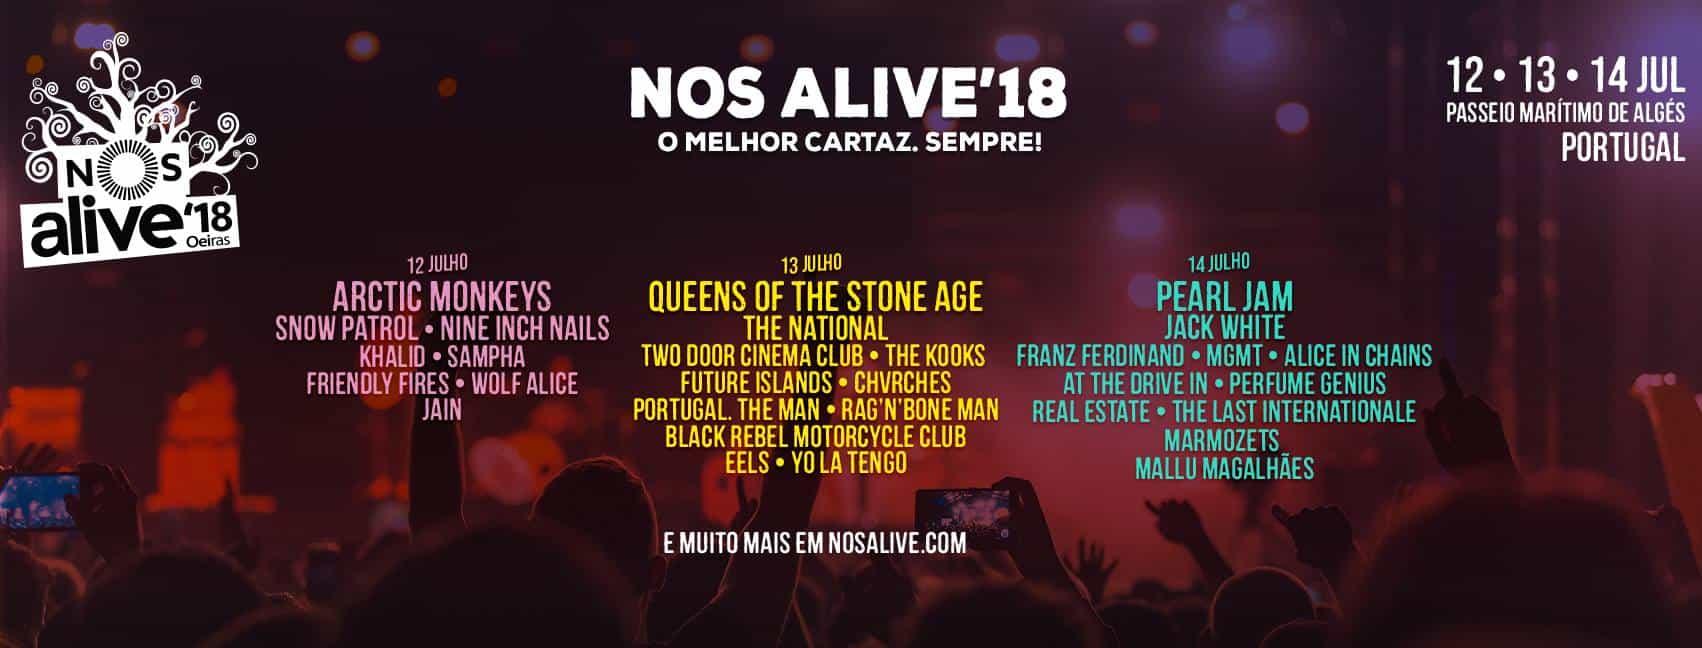 NOS Alive '18 Cartaz - Cifras.pt